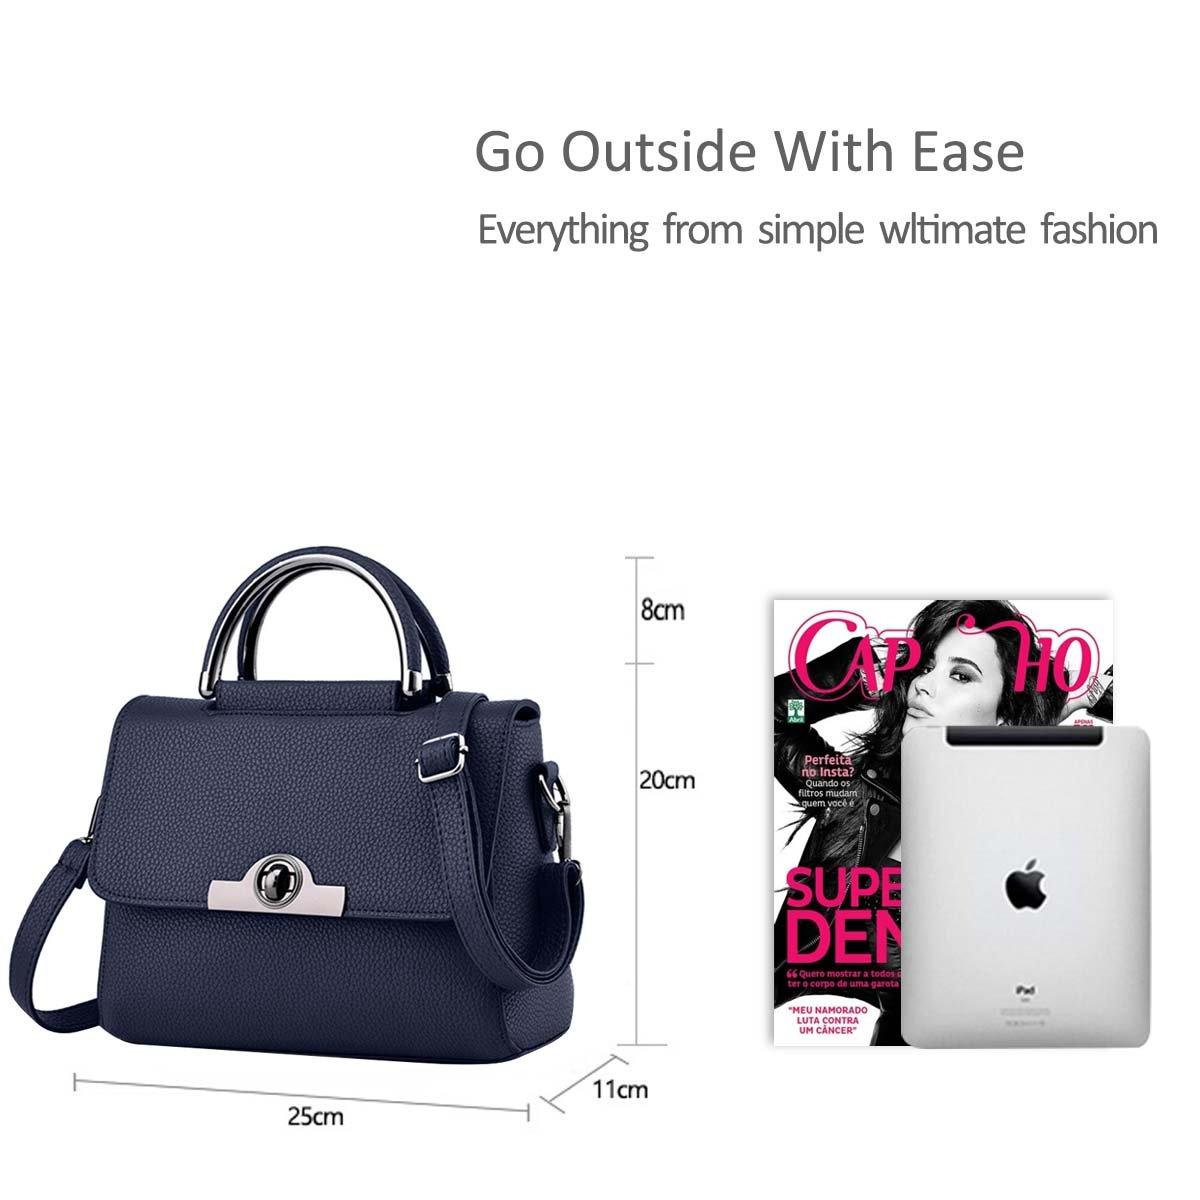 b9c258de6a0 Nicole Doris New Bag Ladies Fashion Handbags Mini Shoulder Messenger Bag  Women Purse(Deep Blue)  Amazon.in  Shoes   Handbags